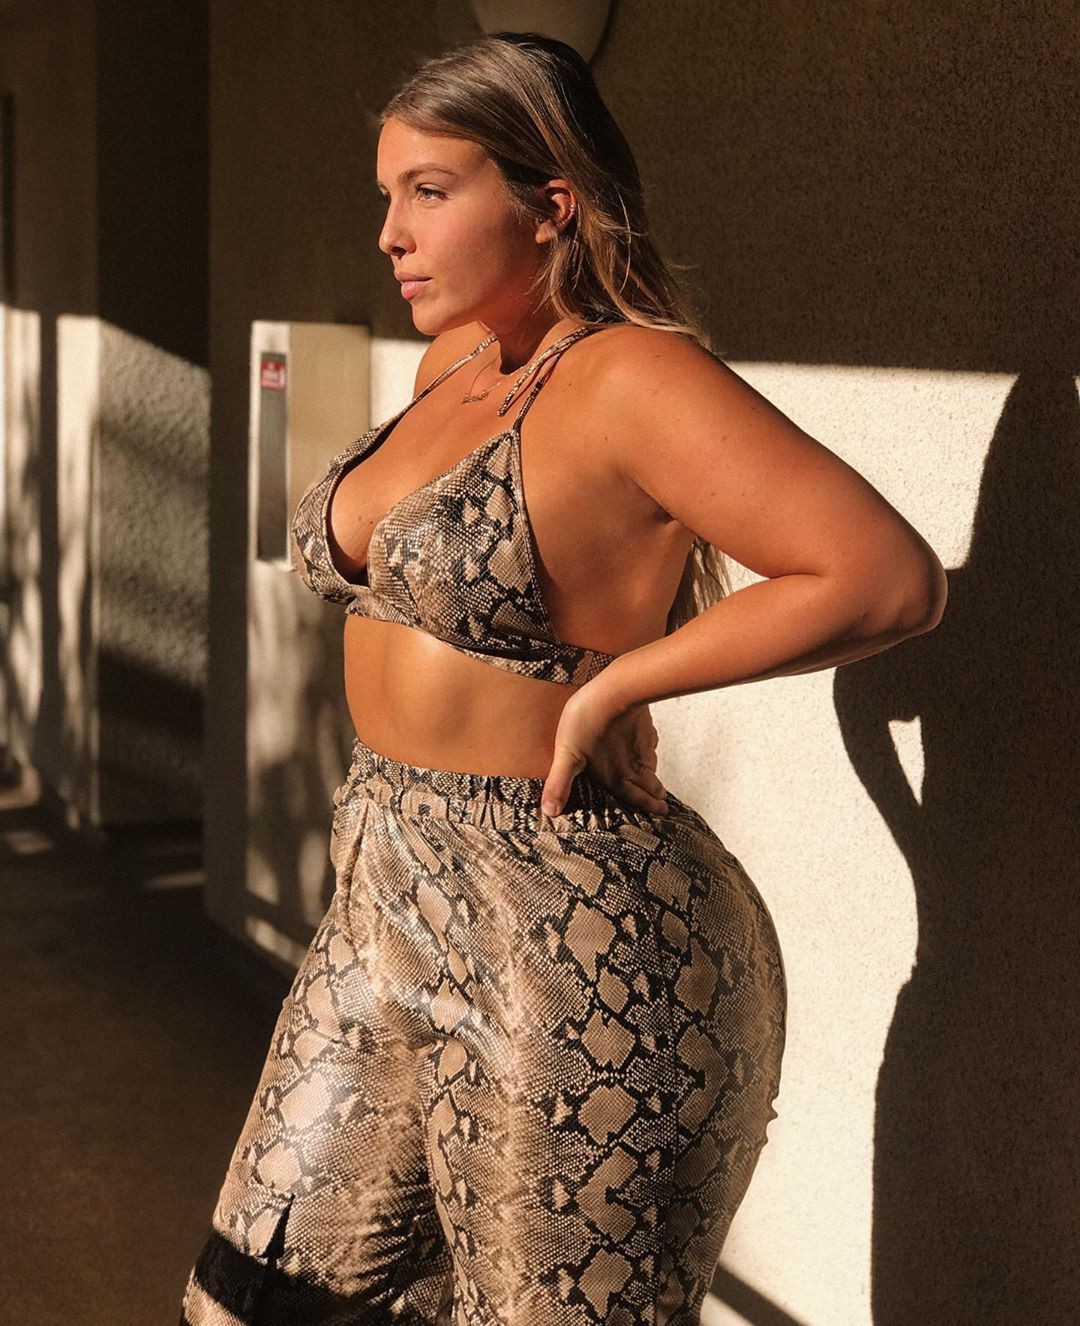 Stephanie Viada thigh pics, fine legs, Hot Model Wallpaper